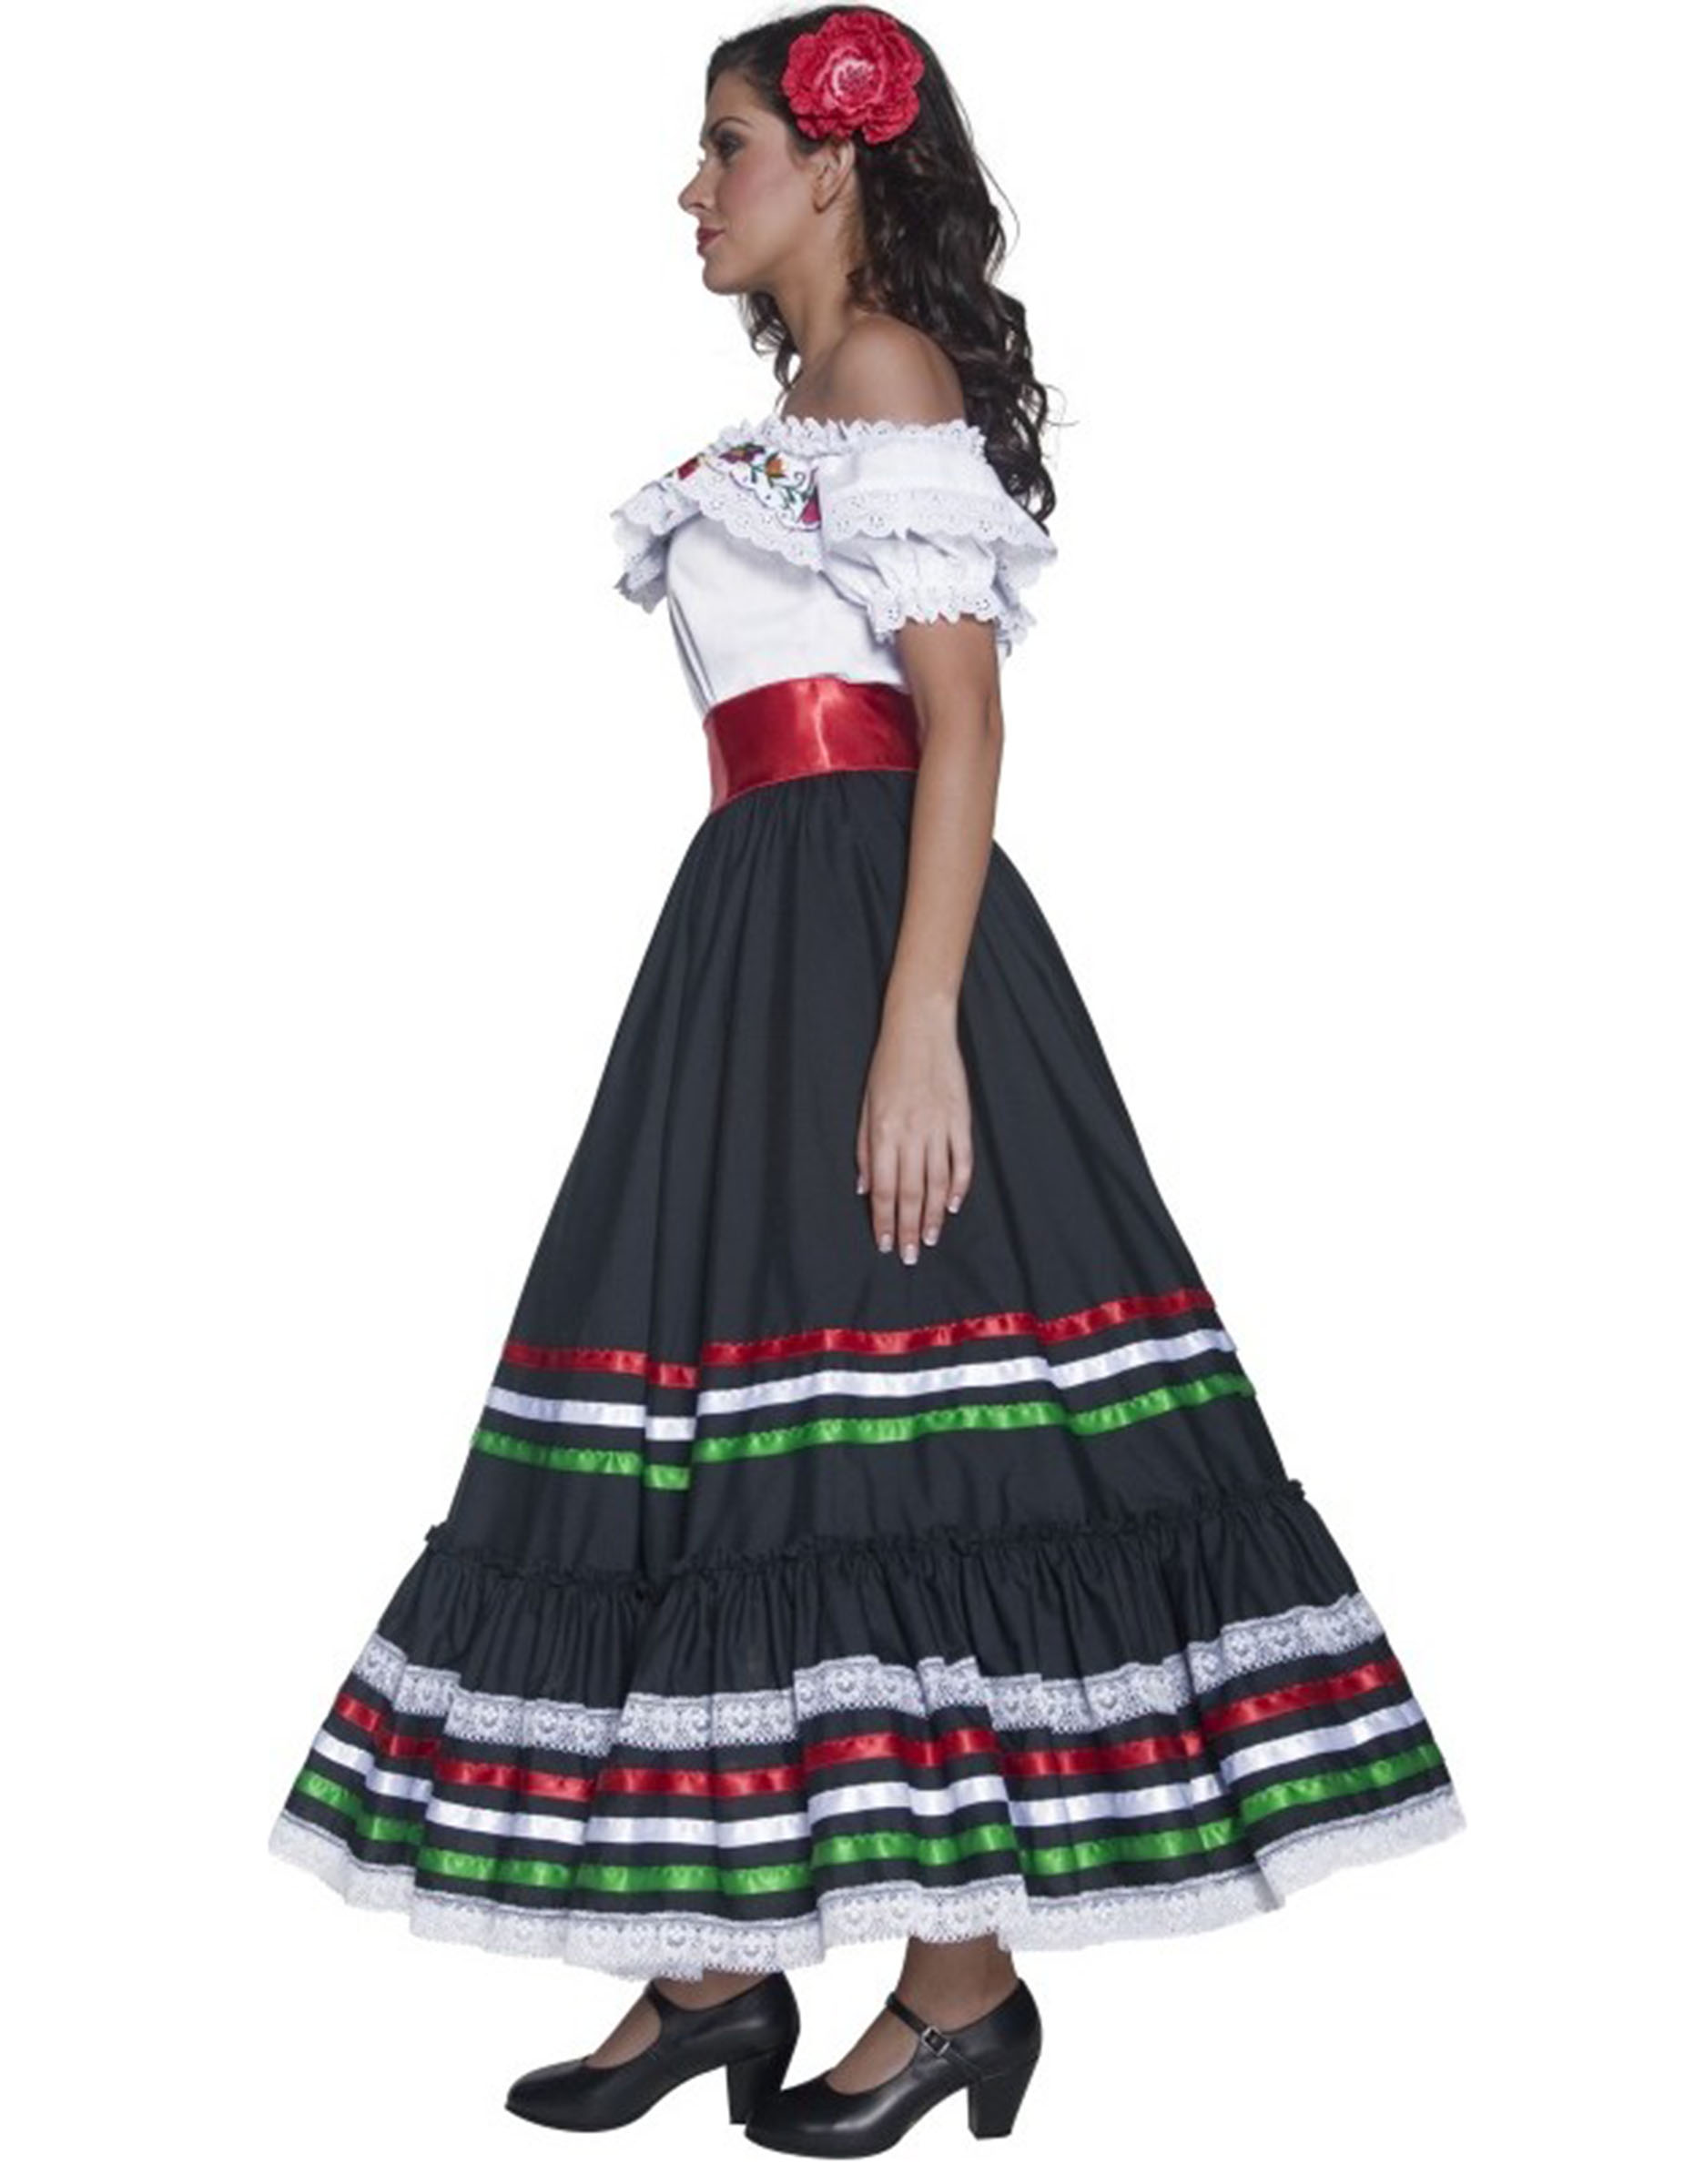 57d1e49c19 Disfraz de mejicana mujer  Disfraces adultos